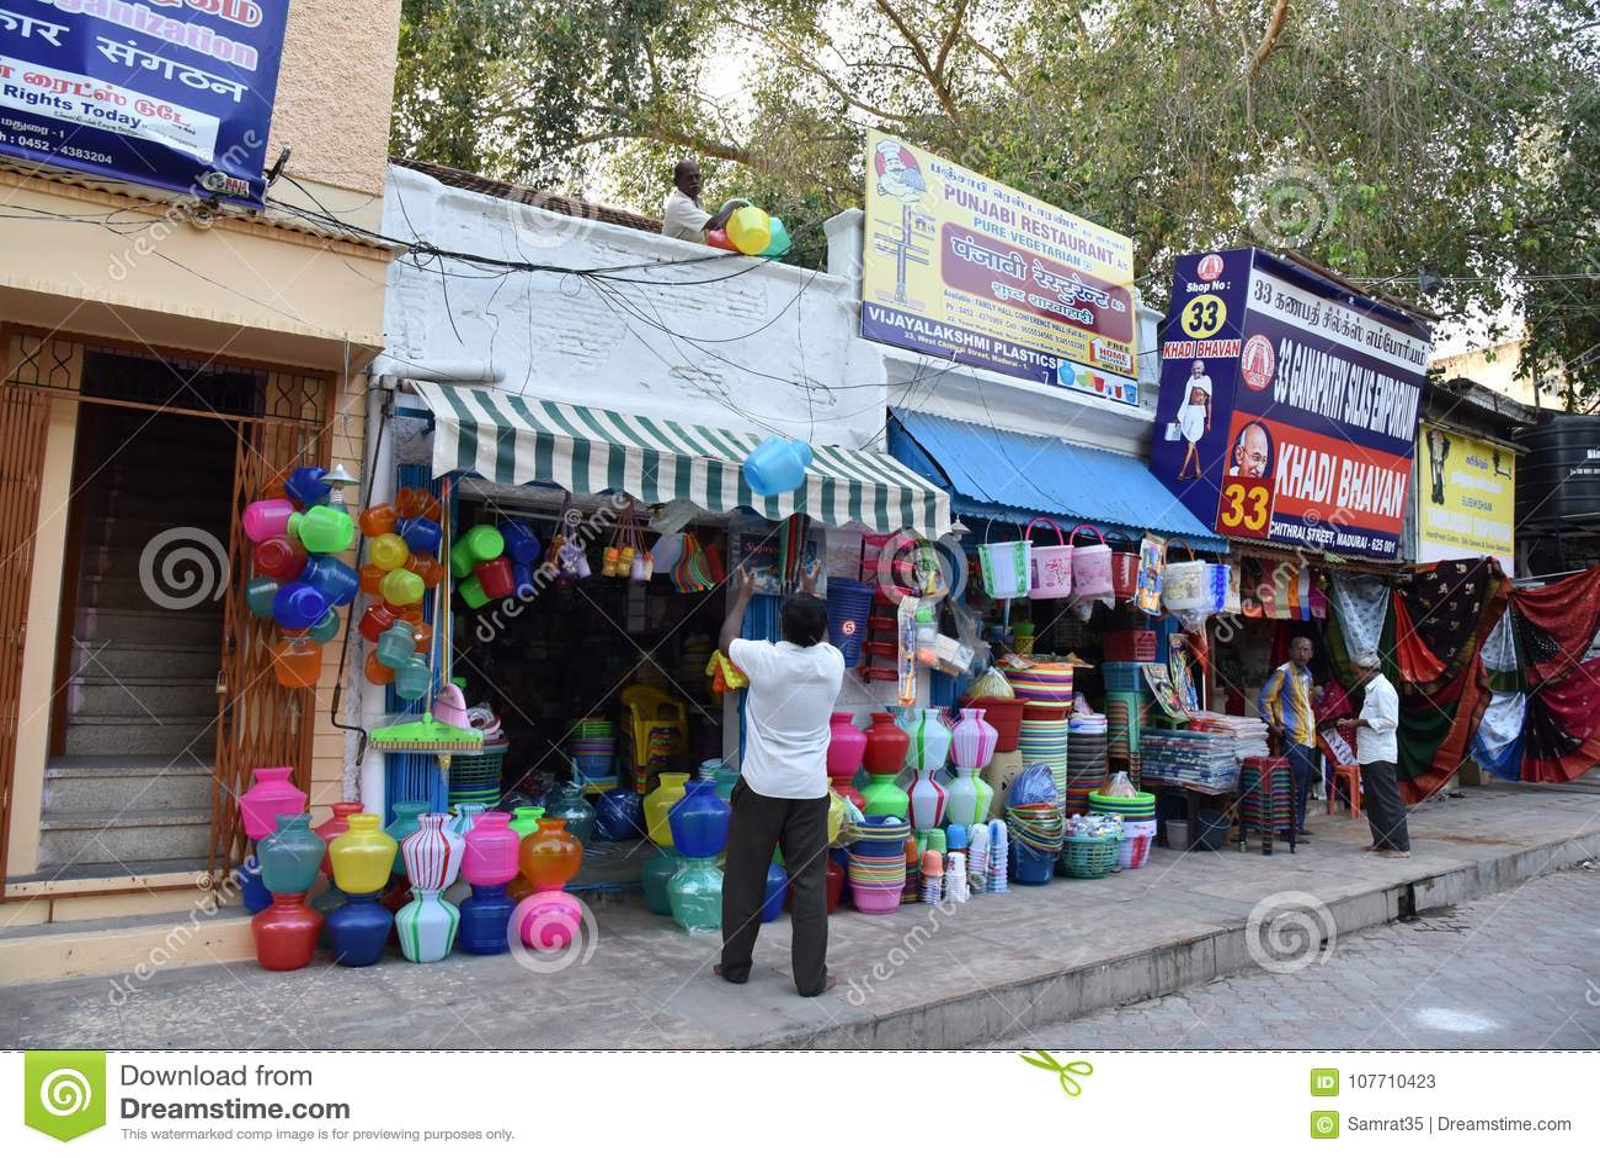 ac18aaed4e5 Meenakshi Sundareswarar Temple or Meenakshi Amman Temple is located in the  holy city of Madurai, Tamil Nadu, India. Road side shop near the temple.